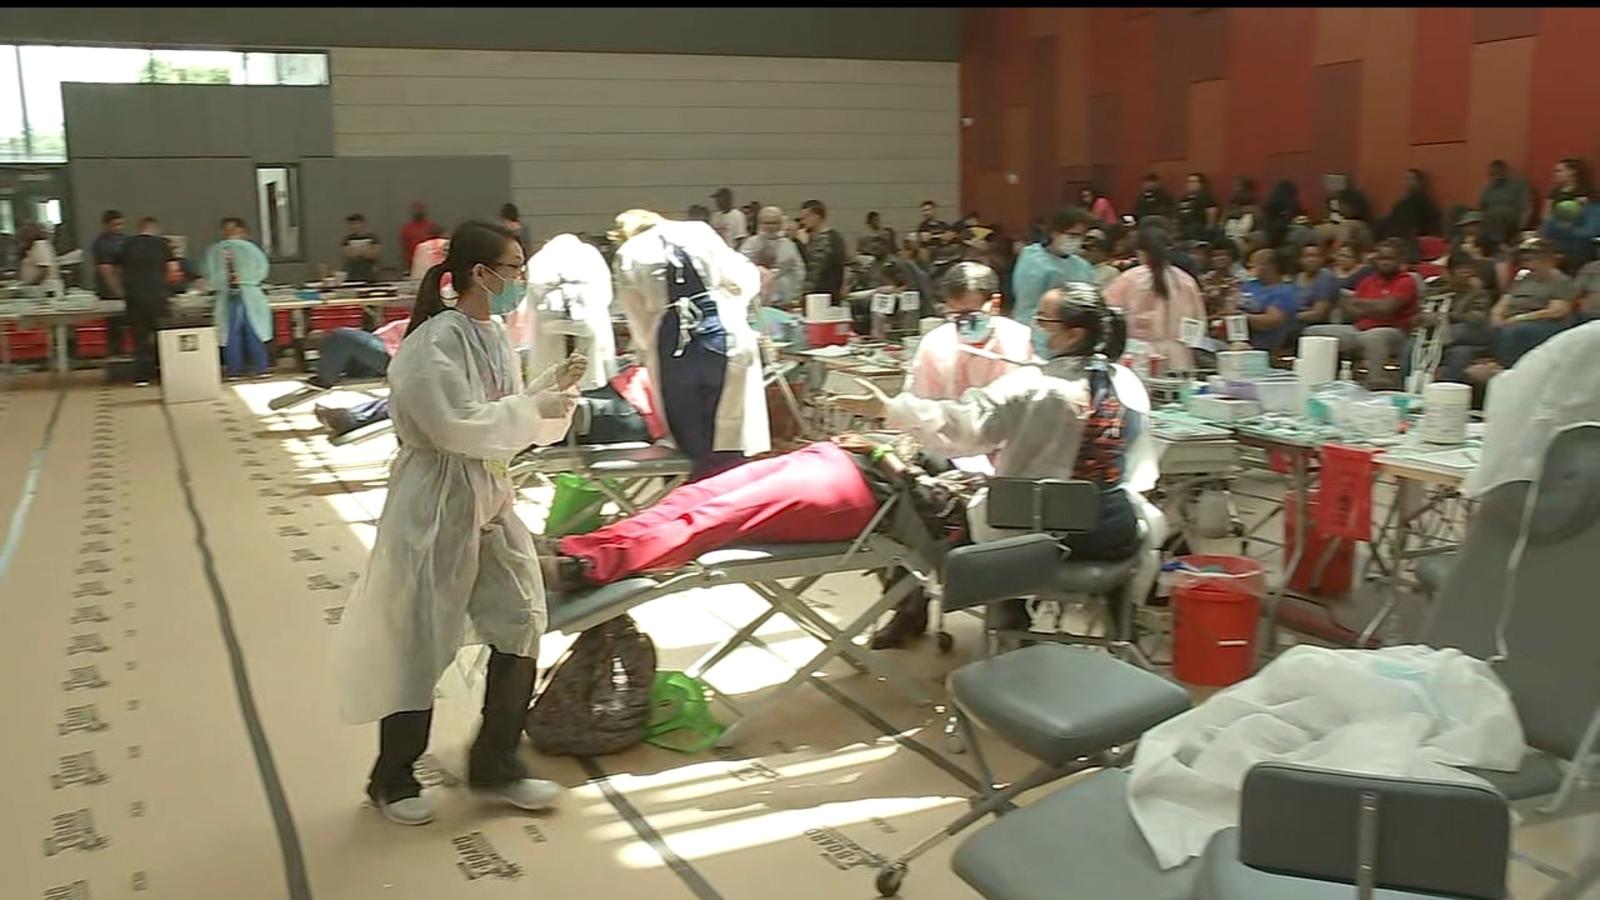 Abc Dental Care free dental clinic opens at emancipation park gymnasium in third ward